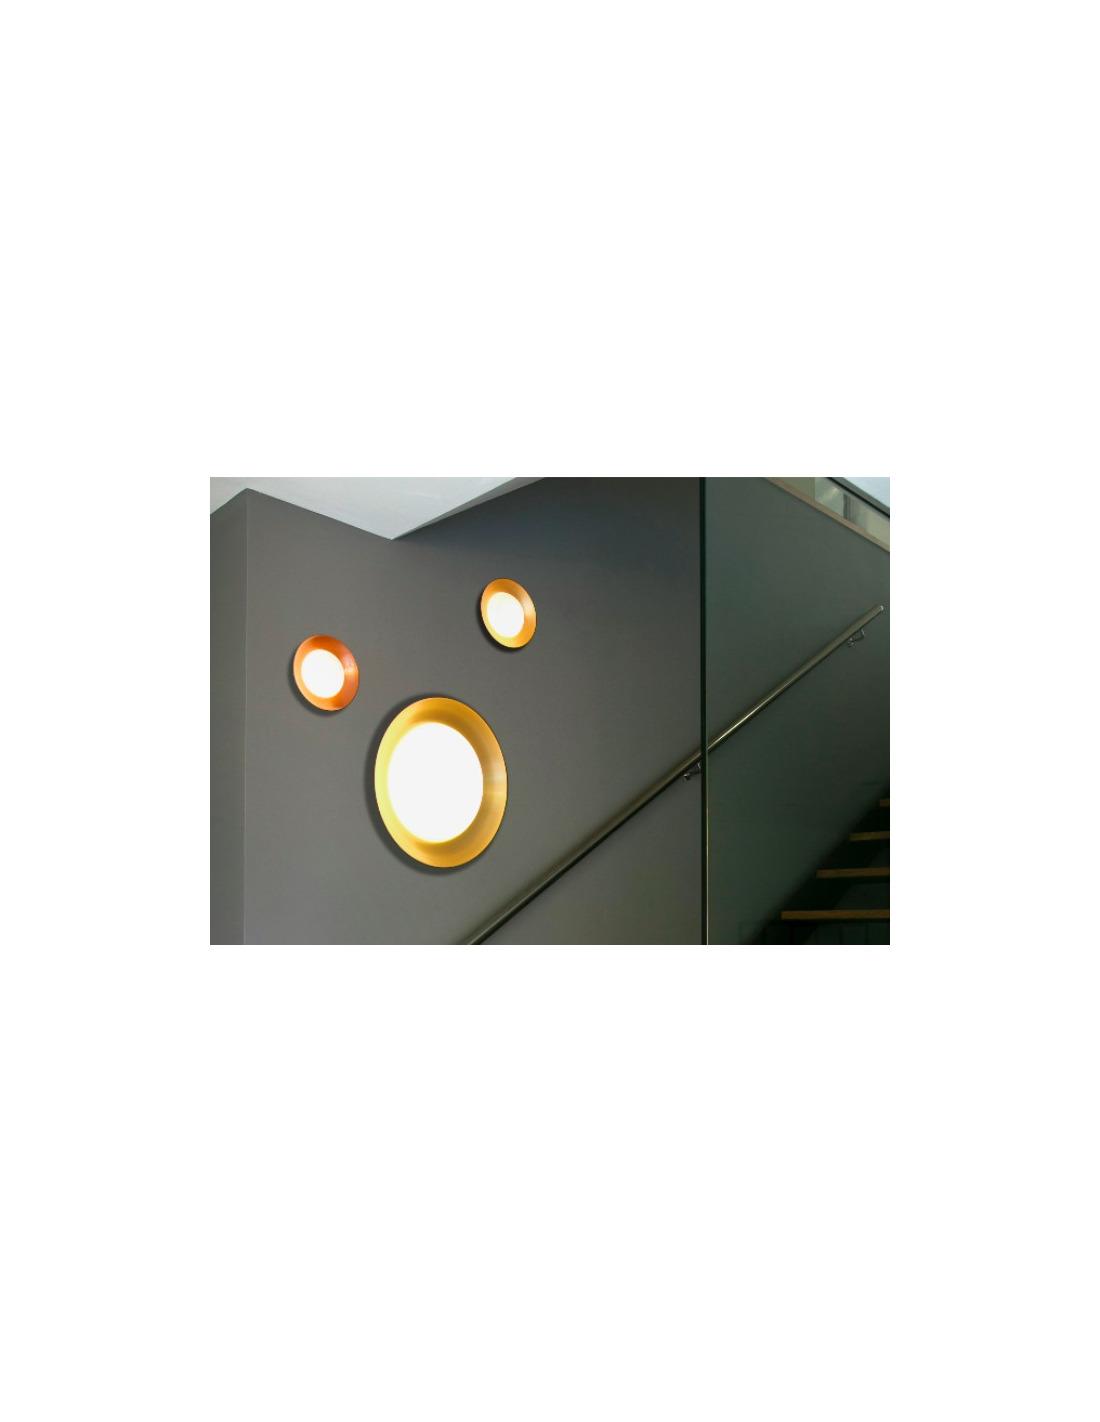 applique murale design globy led 45cm en m tal et verre par alex manel llusc otoko. Black Bedroom Furniture Sets. Home Design Ideas